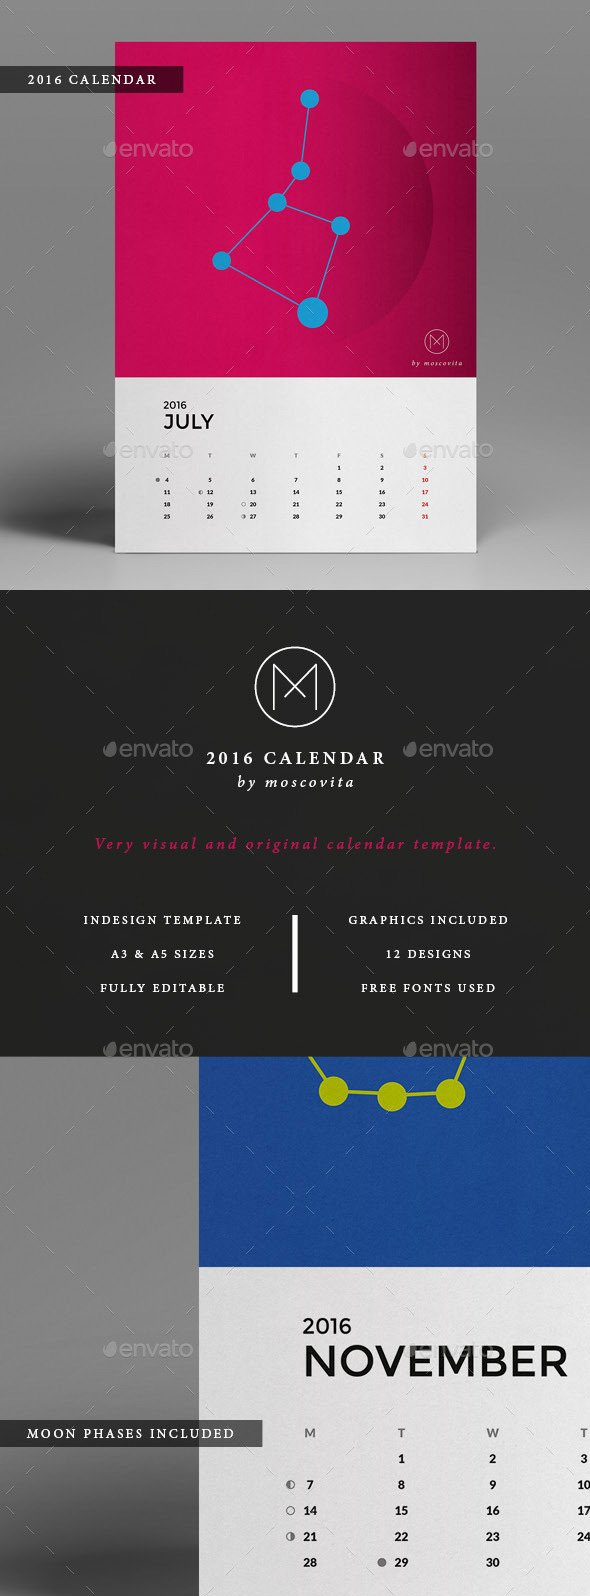 Creative Brandable 2016 Calendar Template